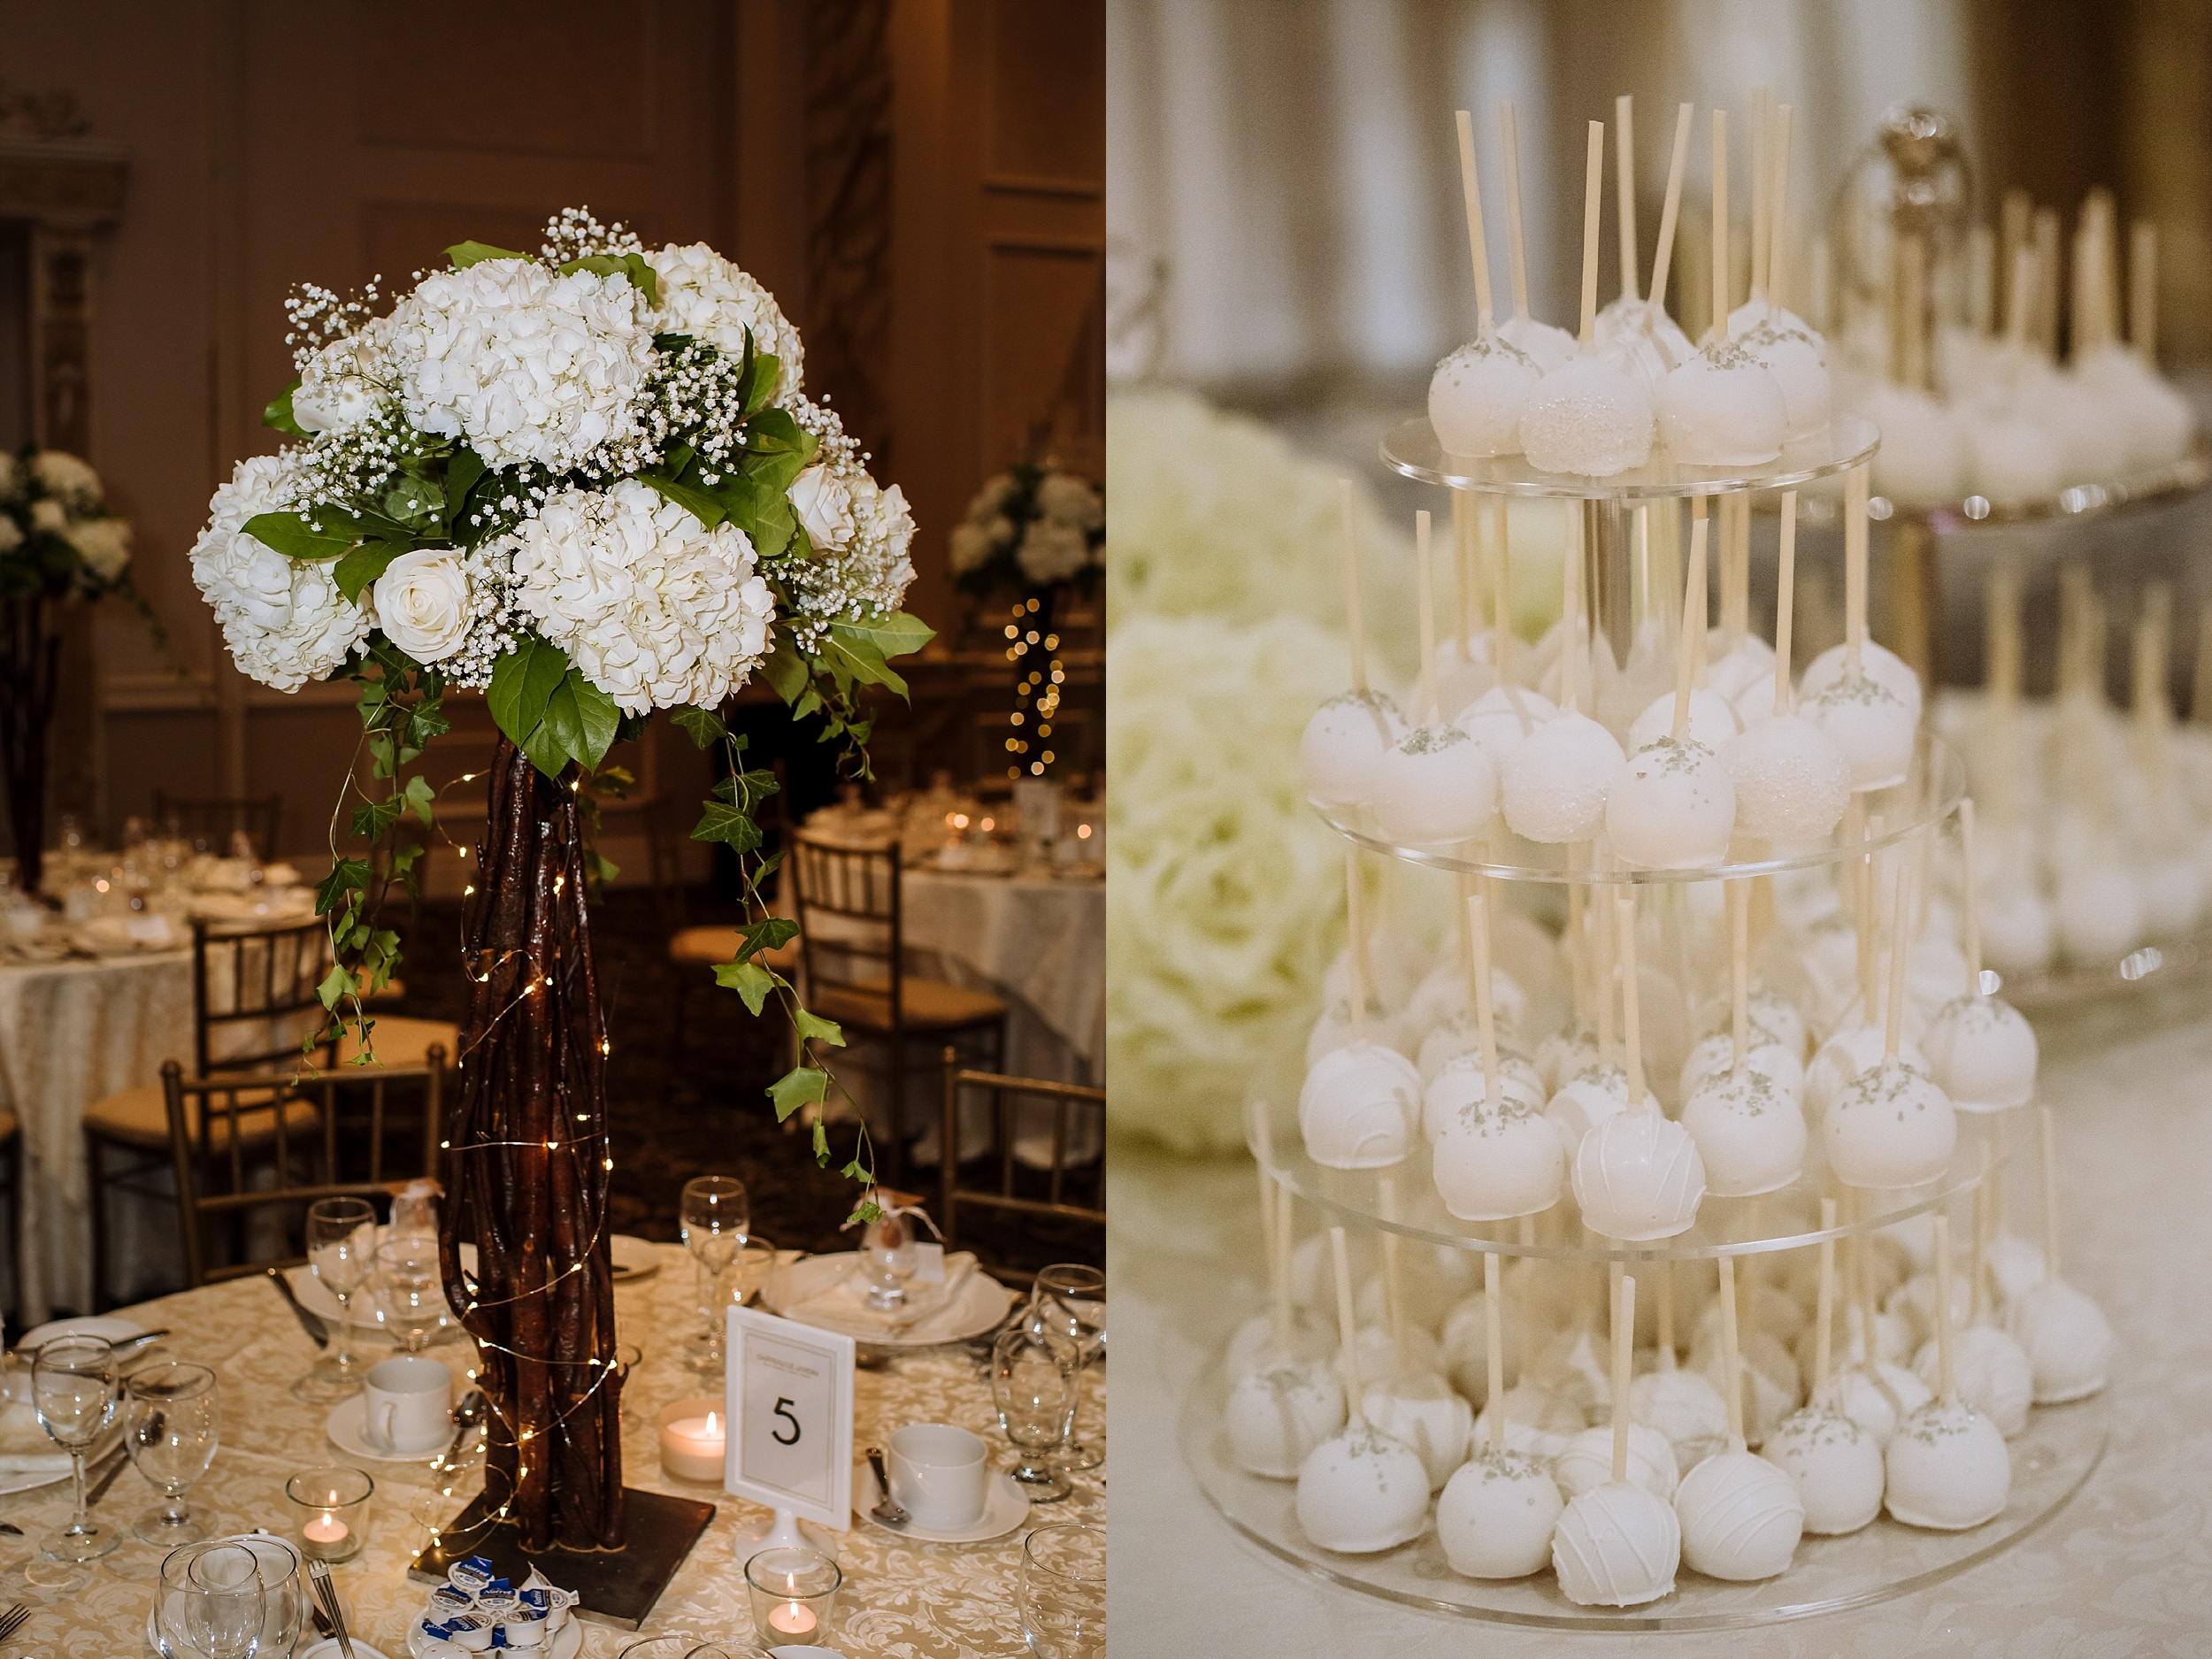 McMichael_Art_Collection_Wedding_chateau_le_jardin_Justine_Munro_Toronto_Photographer065.jpg